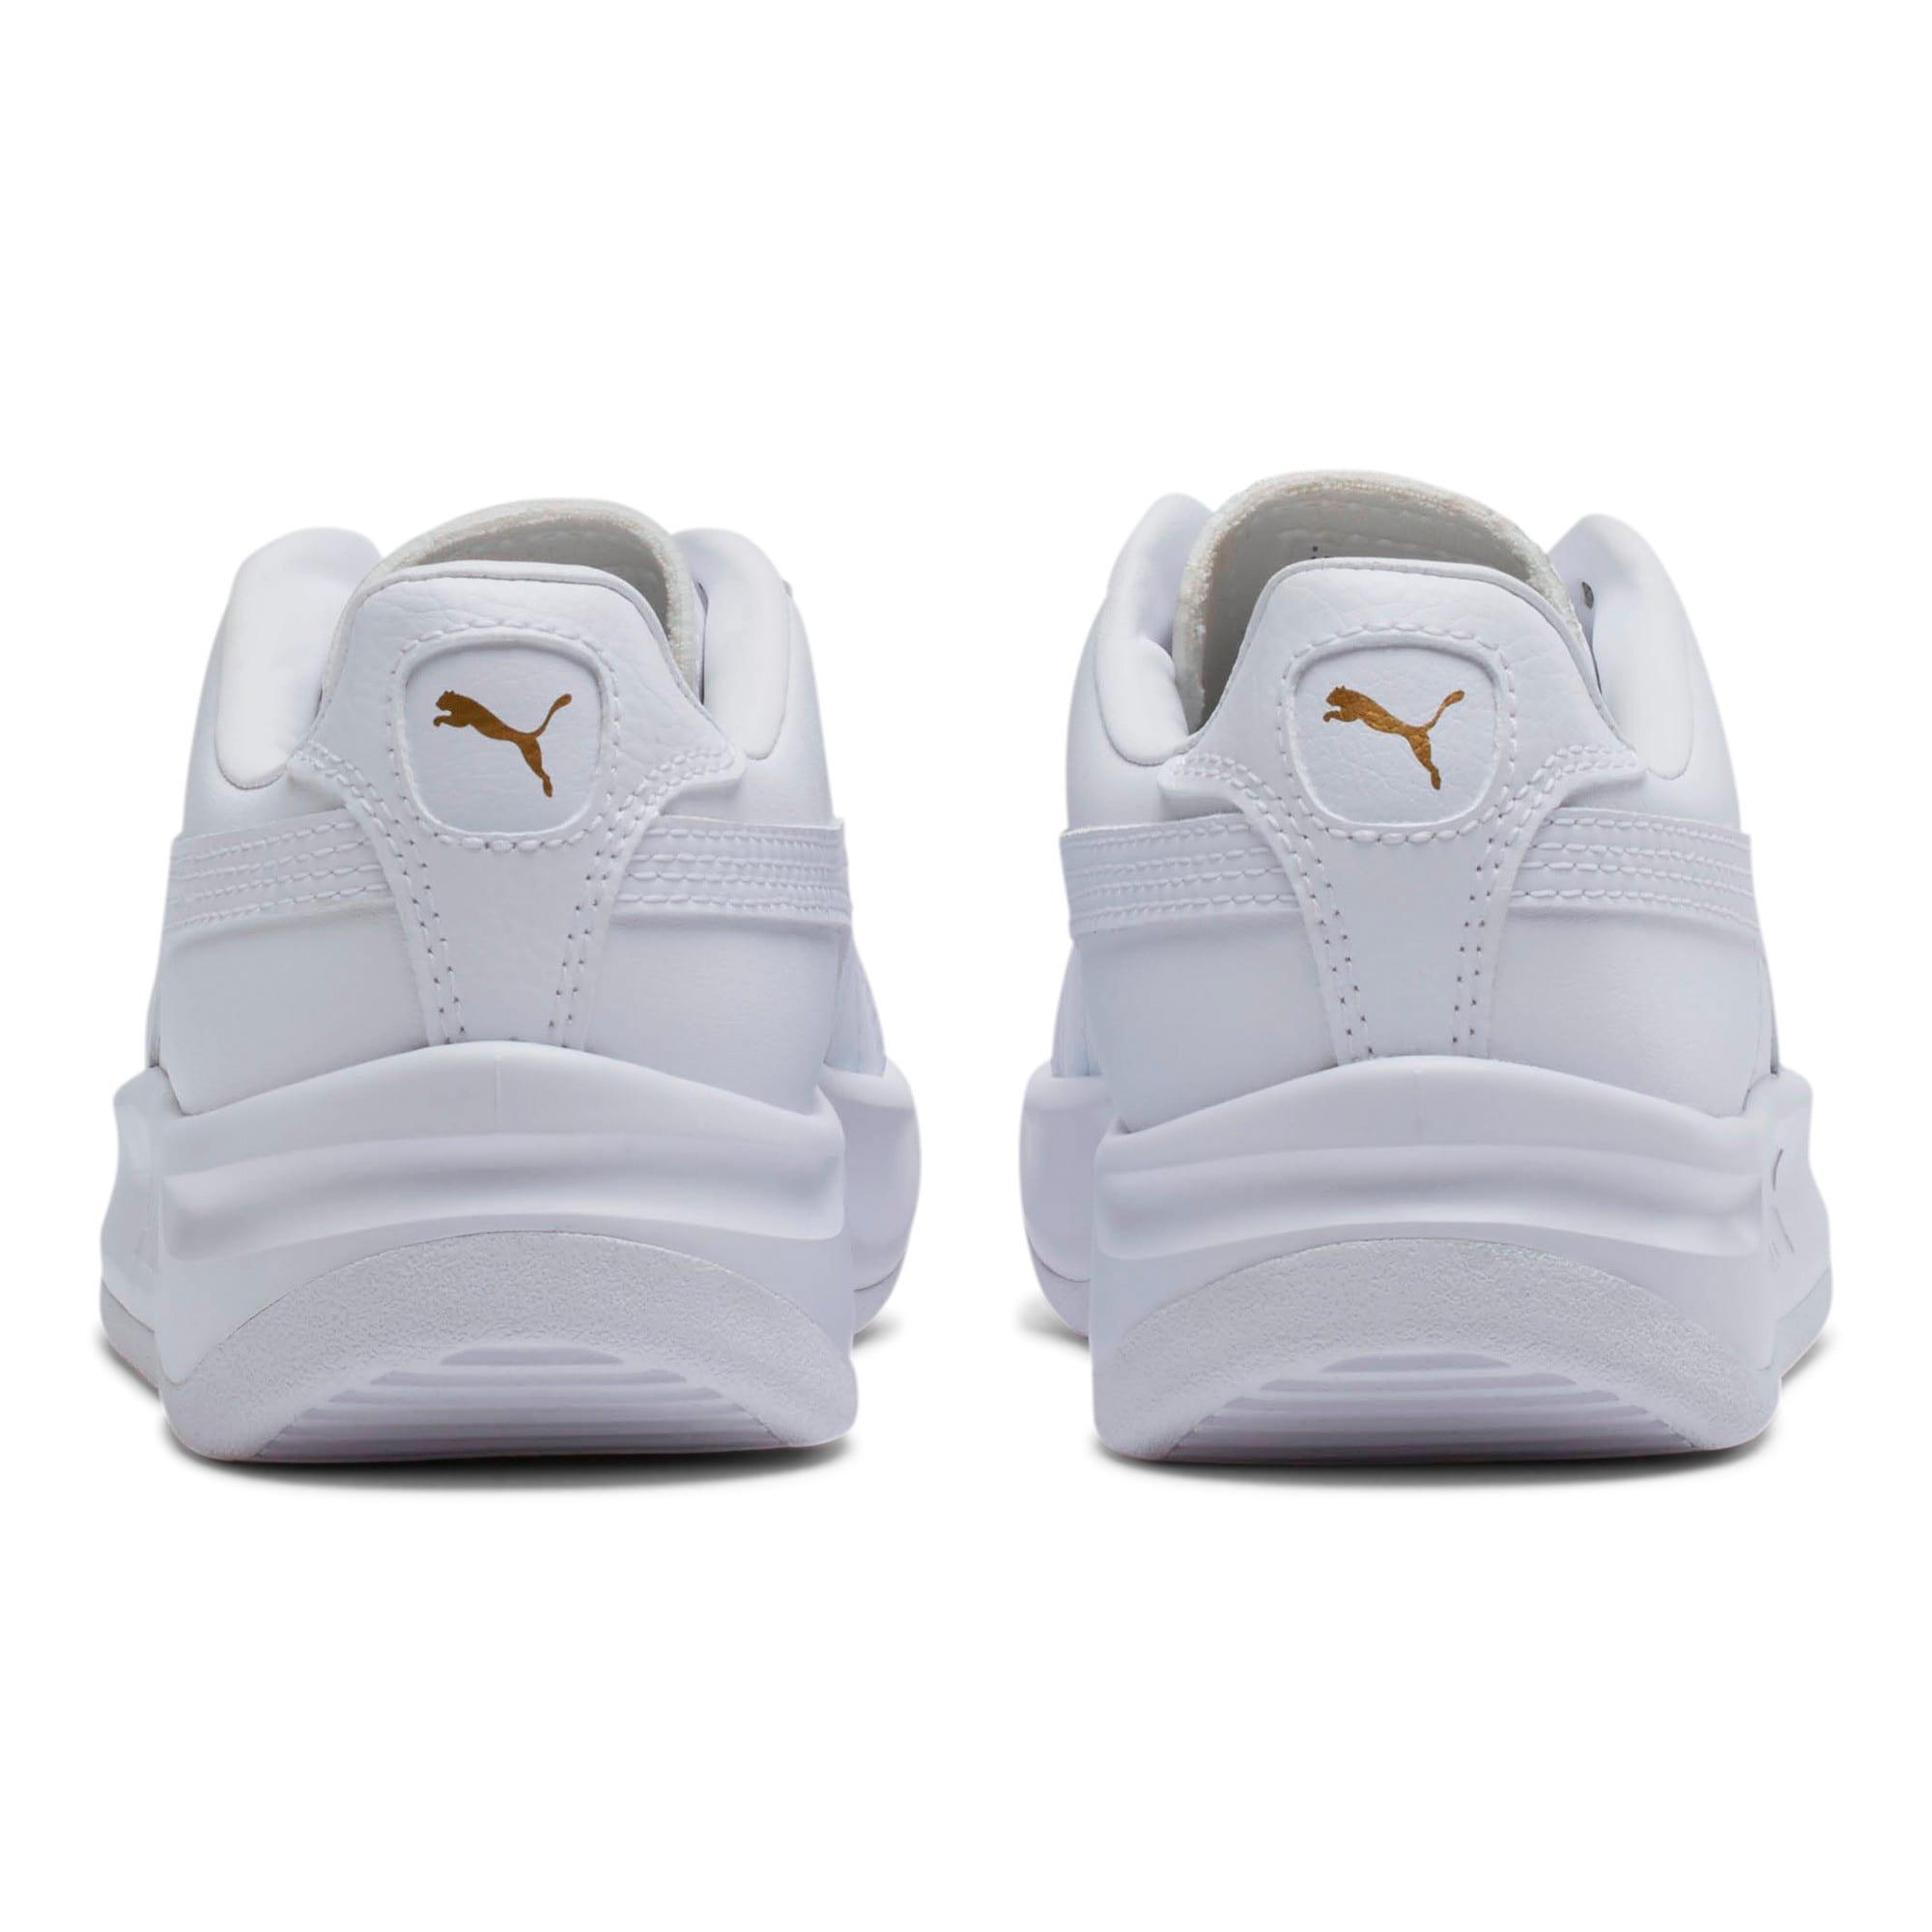 Thumbnail 4 of GV Special Sneakers JR, Puma White-Puma Team Gold, medium